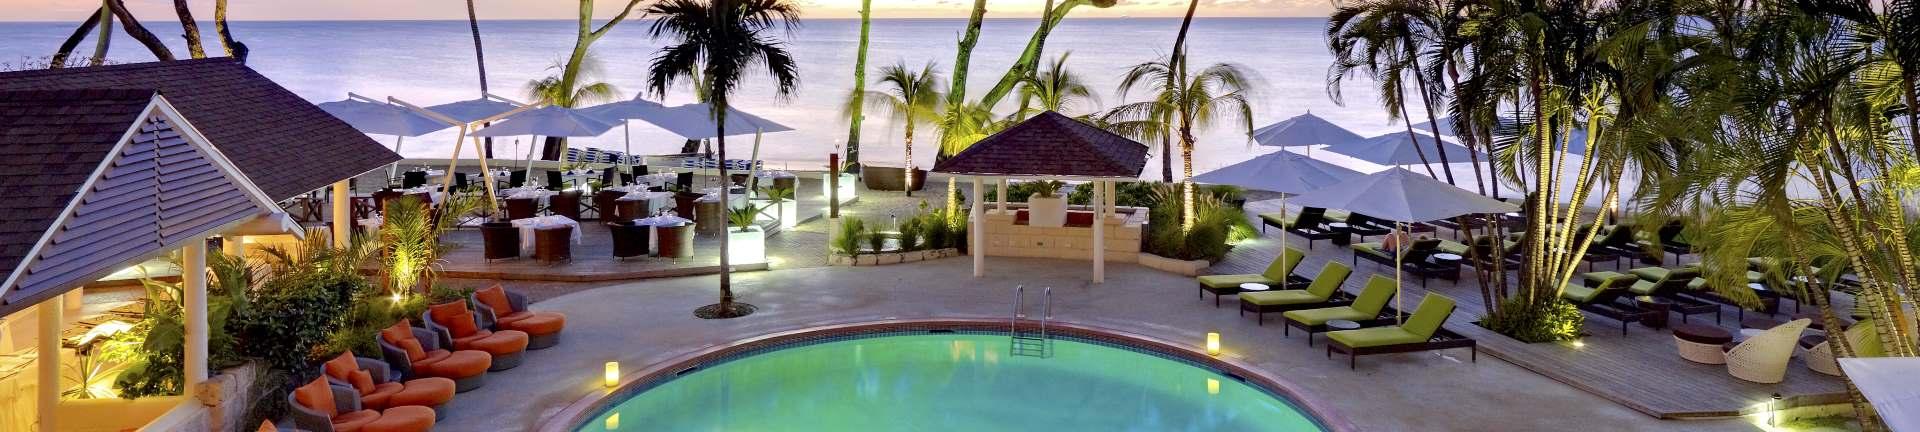 Tamarind by Elegant Hotels  Holiday